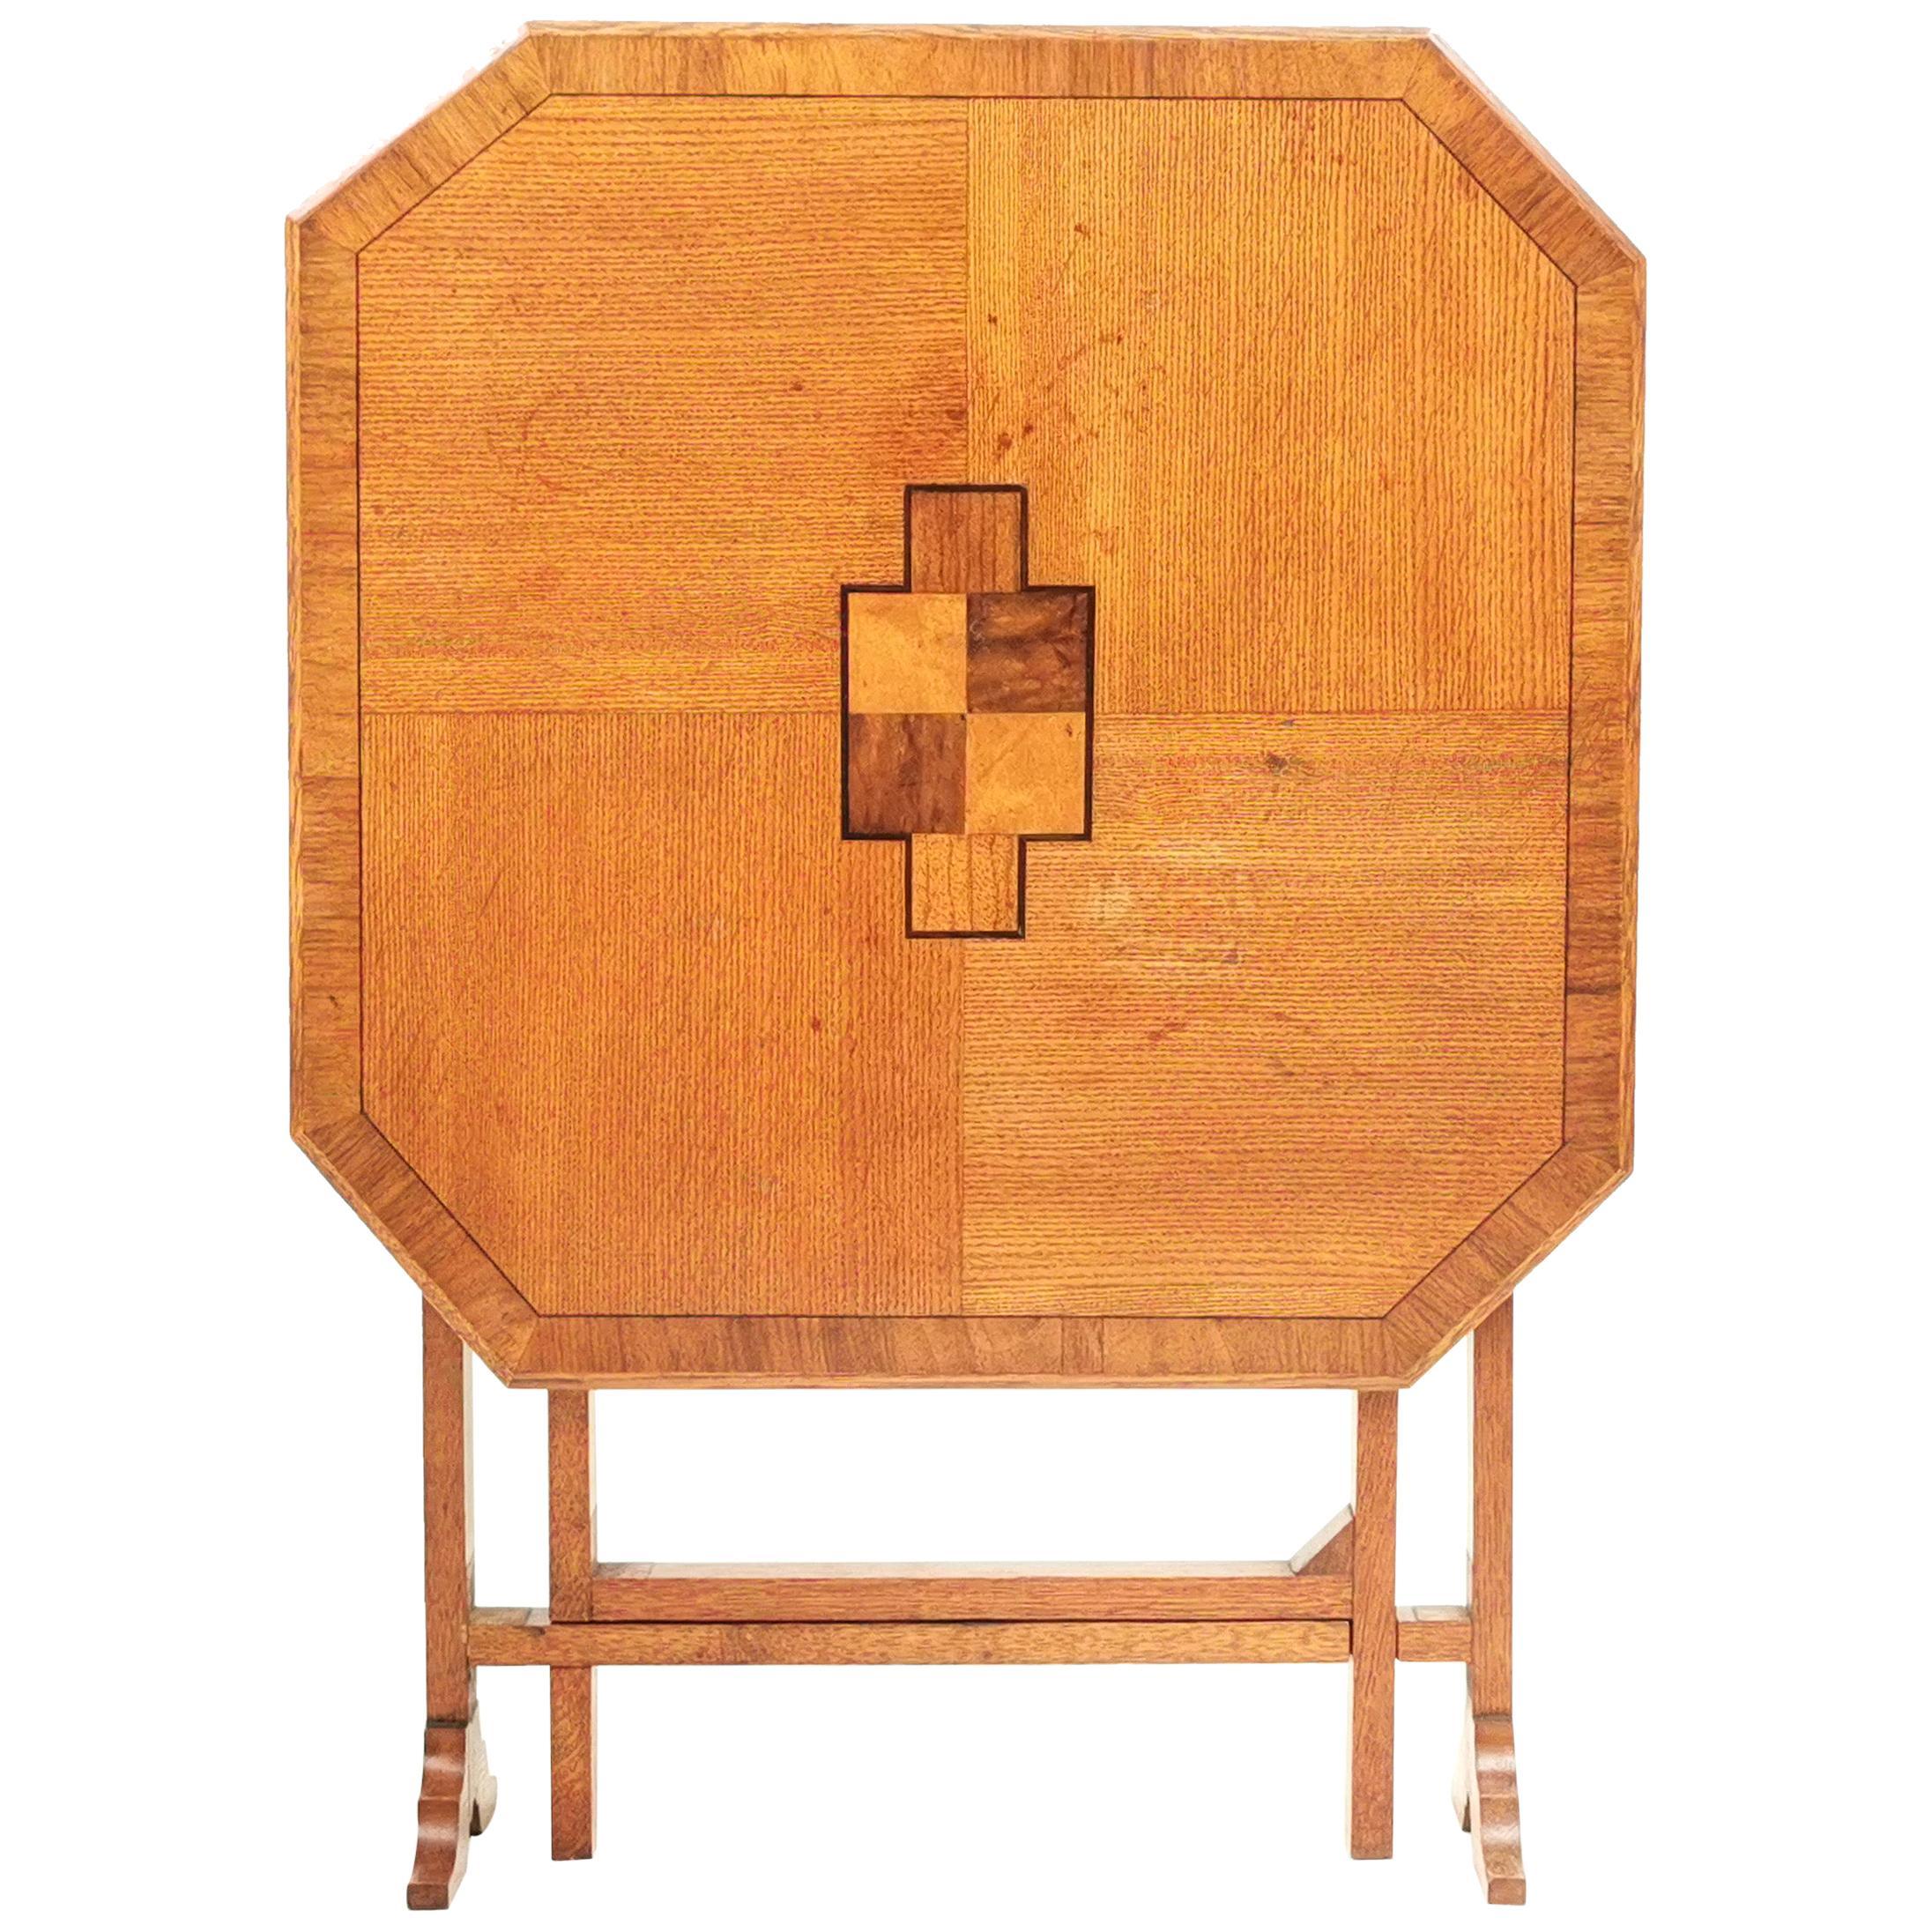 English Oak Art Deco Geometric Side Occasional Coffee Table